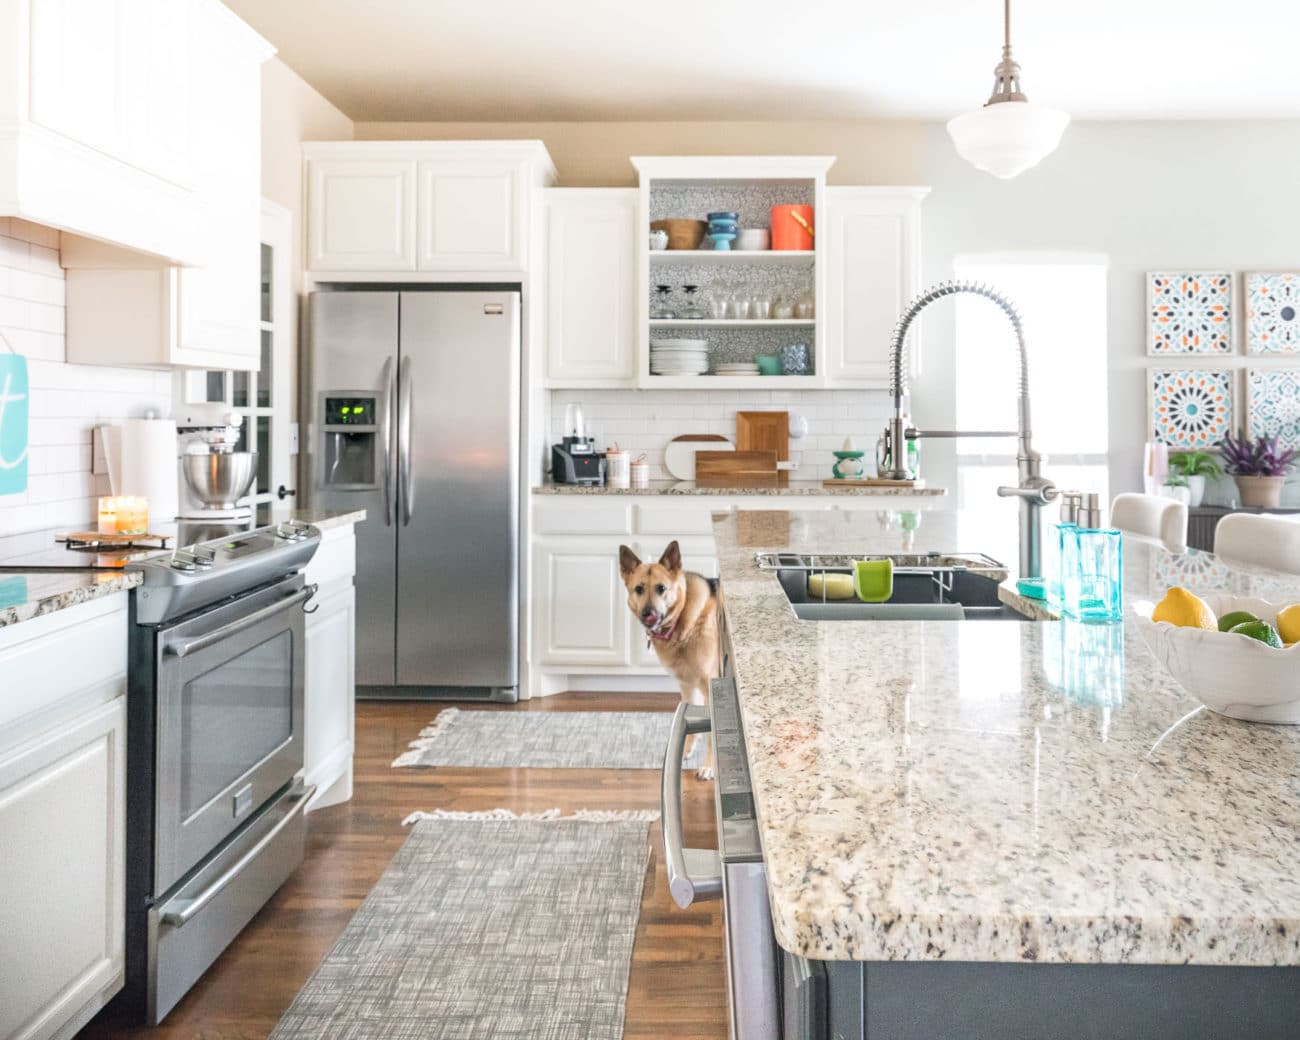 How to Organize Kitchen Cabinets - Polished Habitat